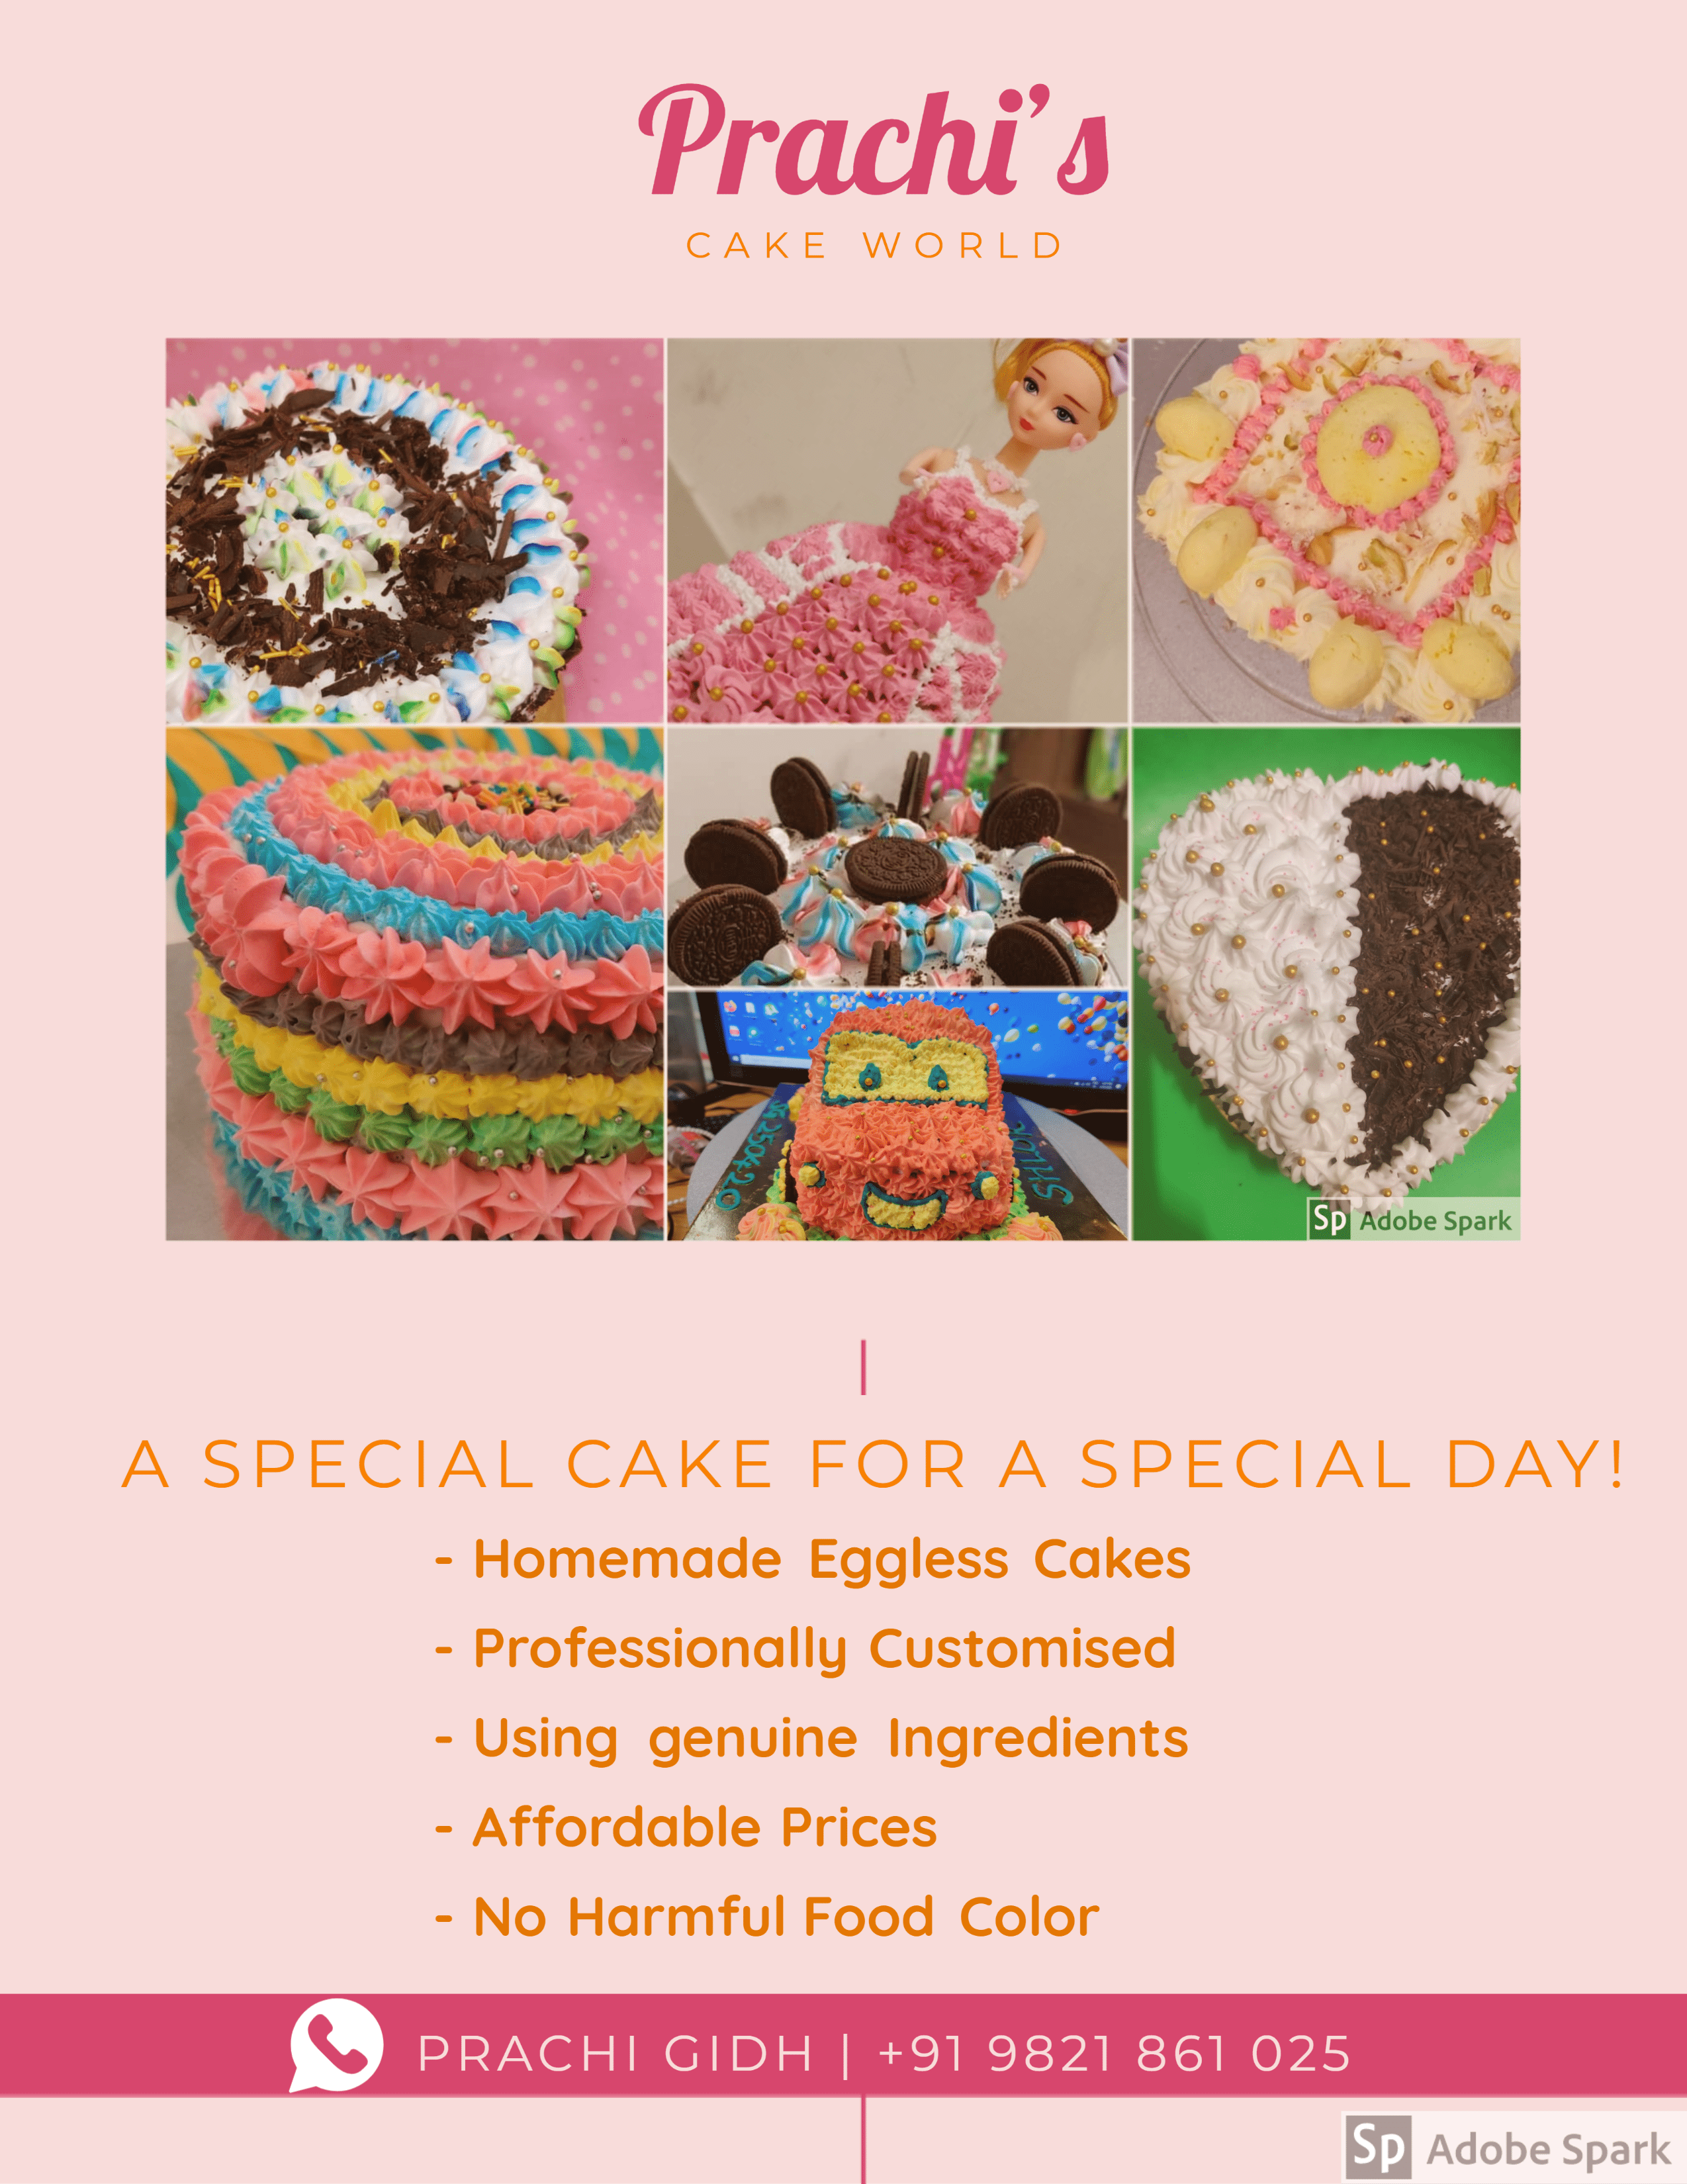 Prachi's cake World